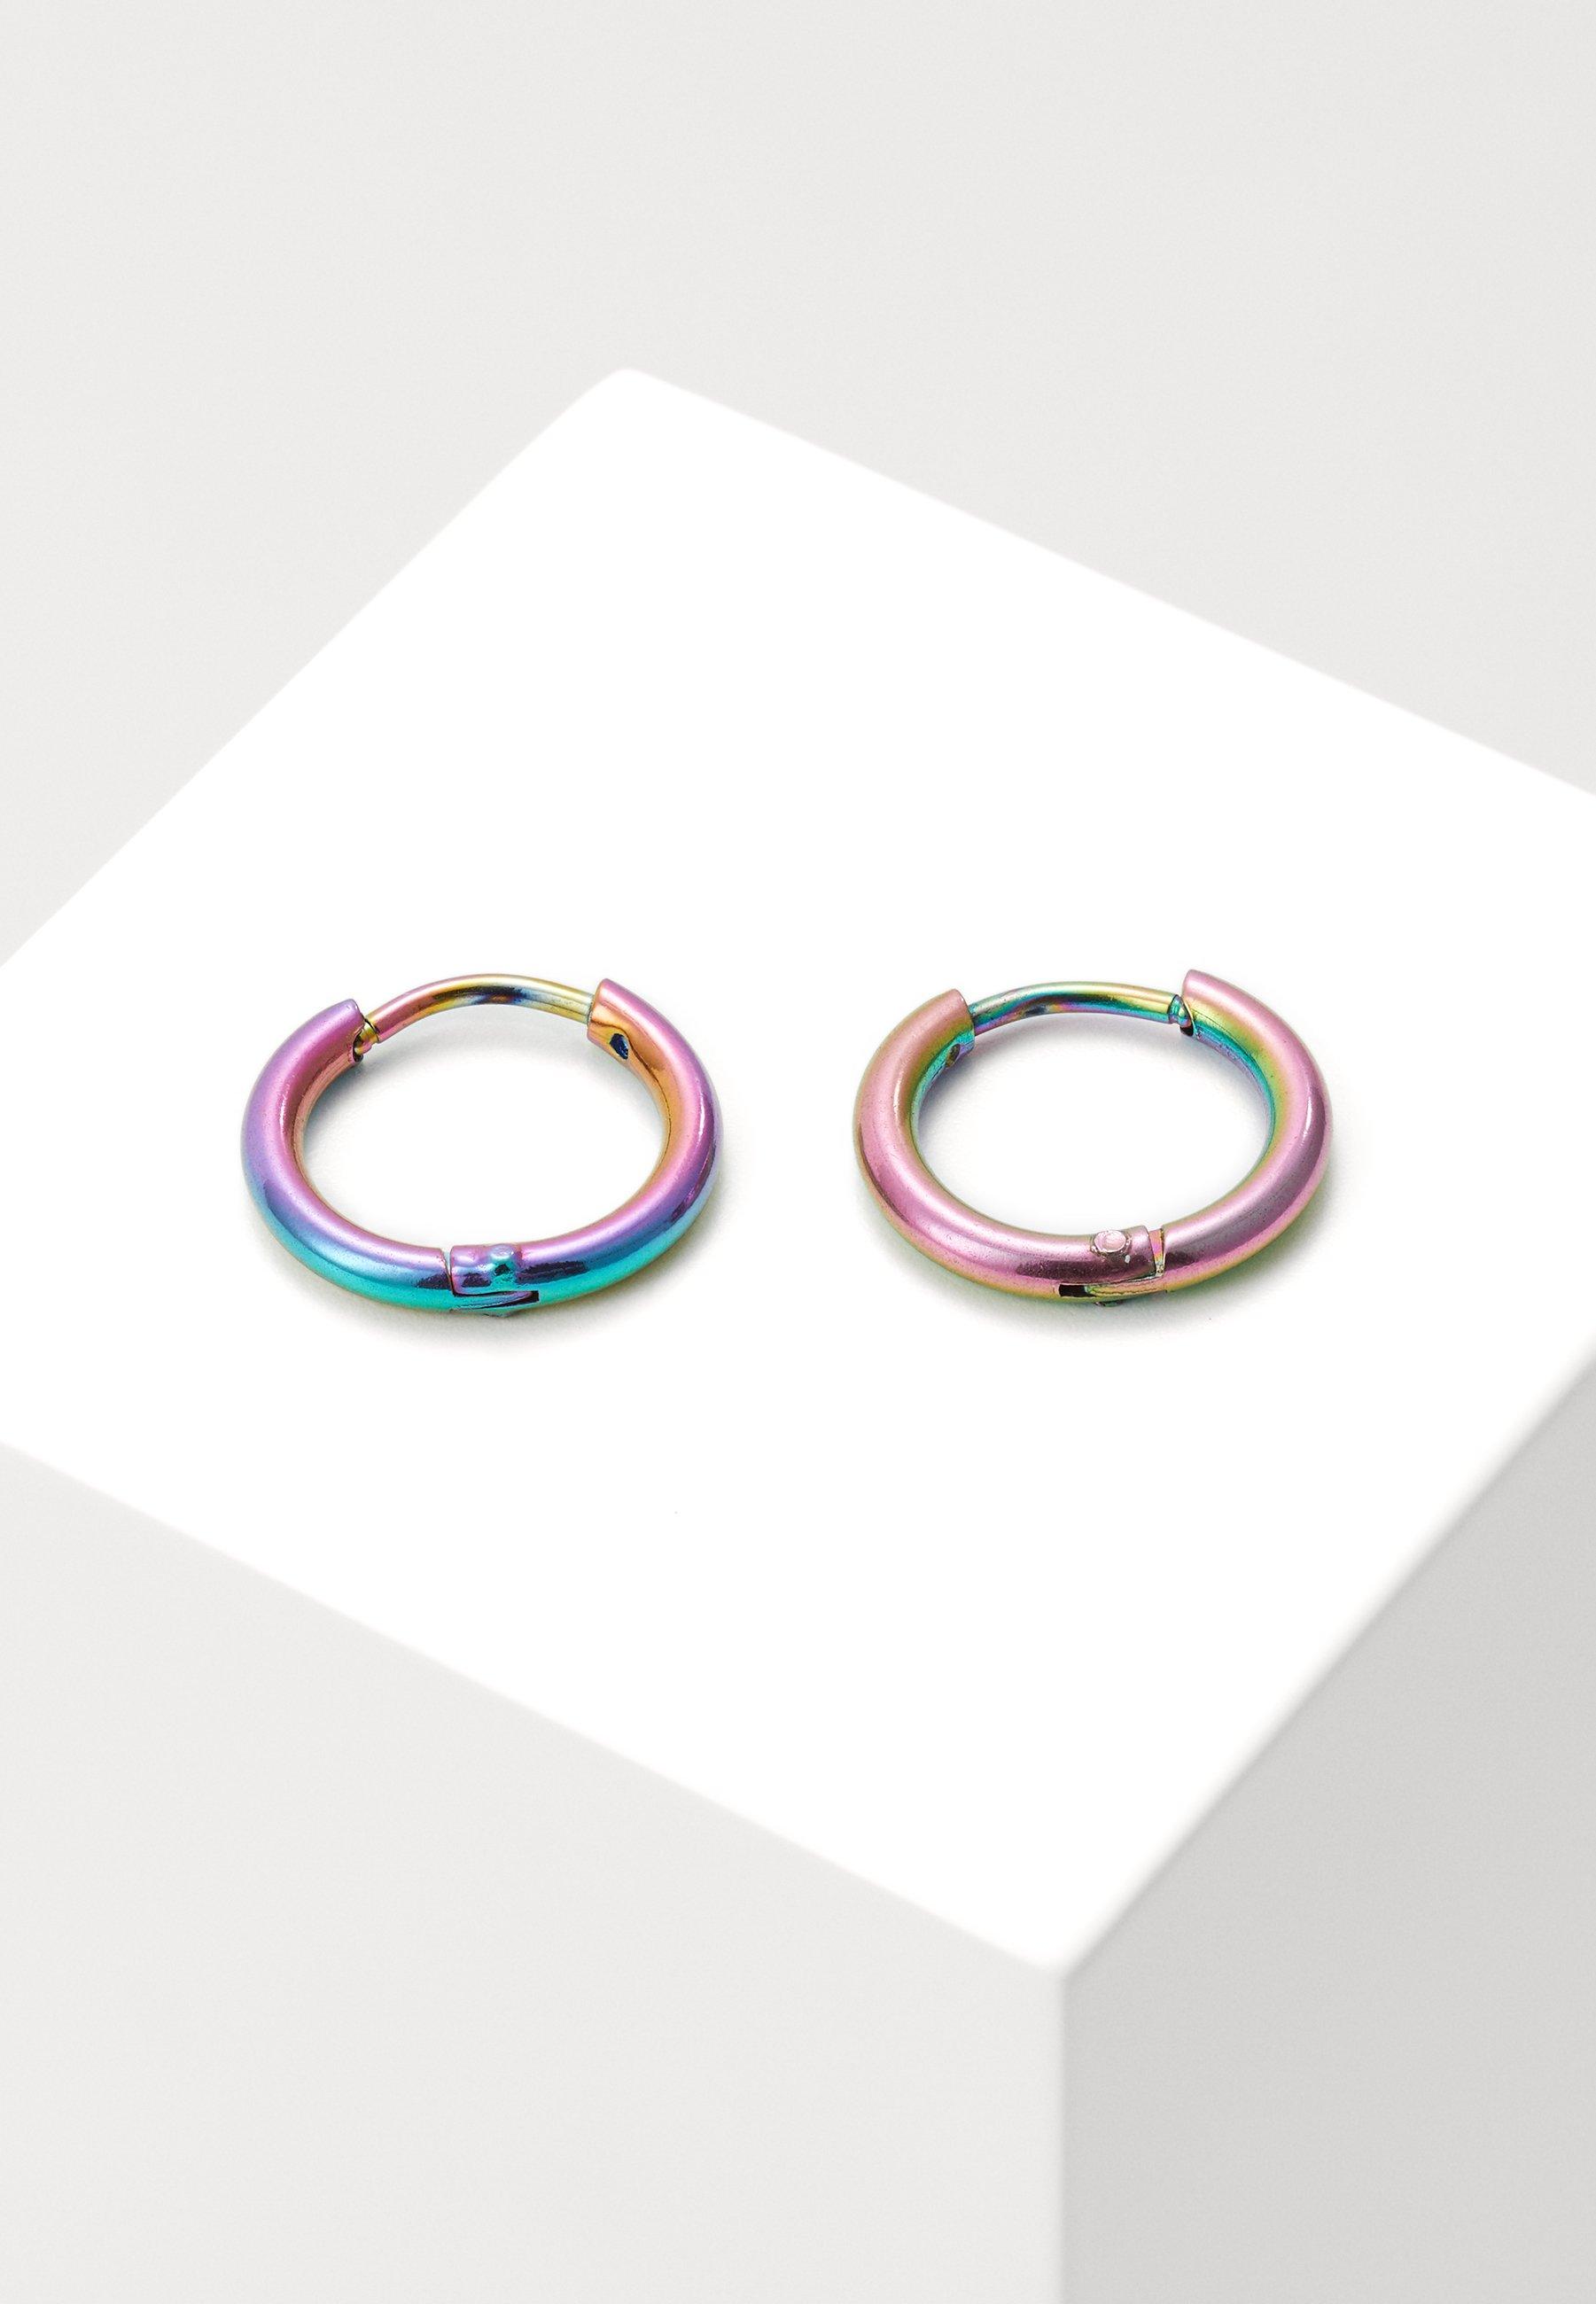 Icon Brand Space Age Hoops - Korvakorut Multicoloured